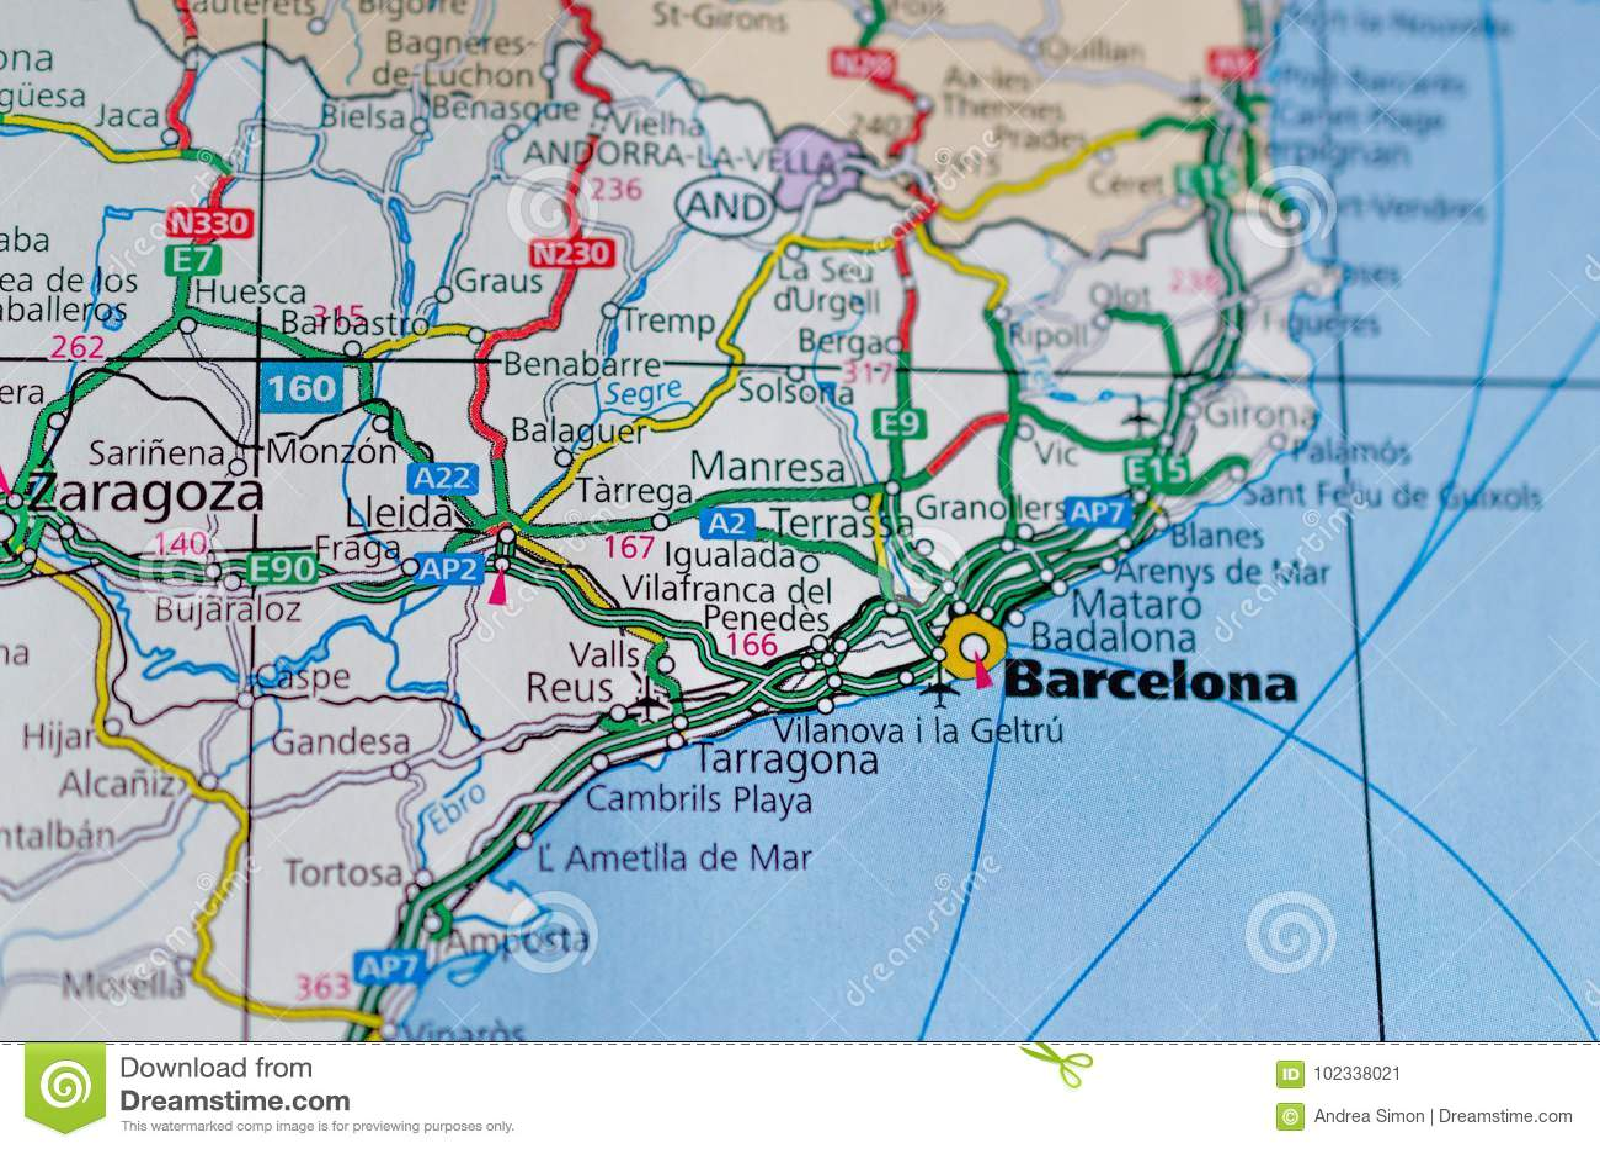 Barcelona on map